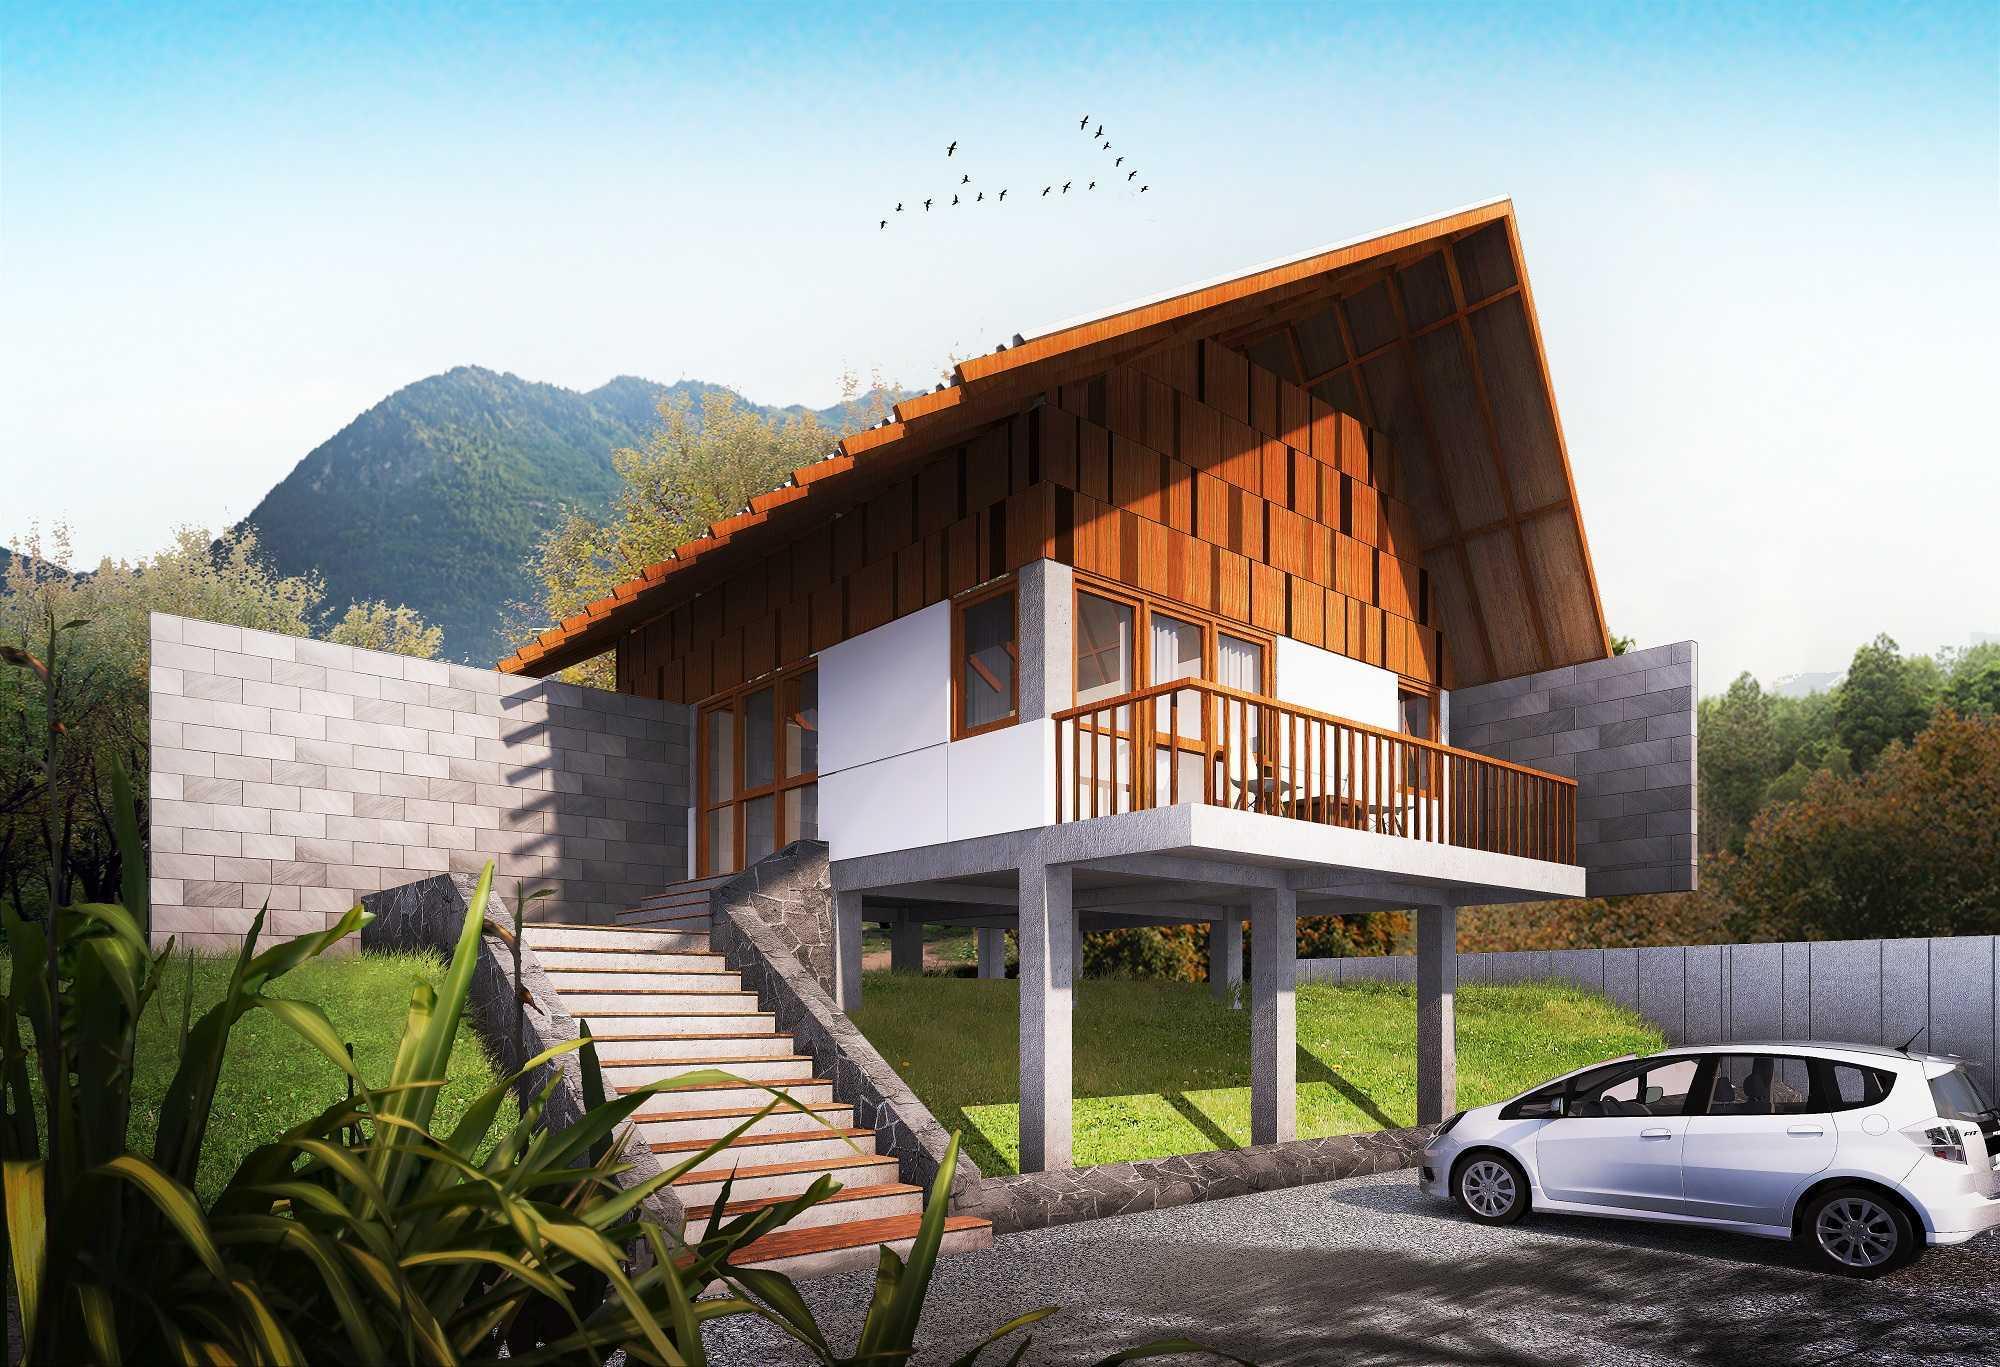 Gubah Ruang Bukit - Home Stay Kabupaten Manokwari, Papua Bar., Indonesia Kabupaten Manokwari, Papua Bar., Indonesia Exterior View Modern  51004